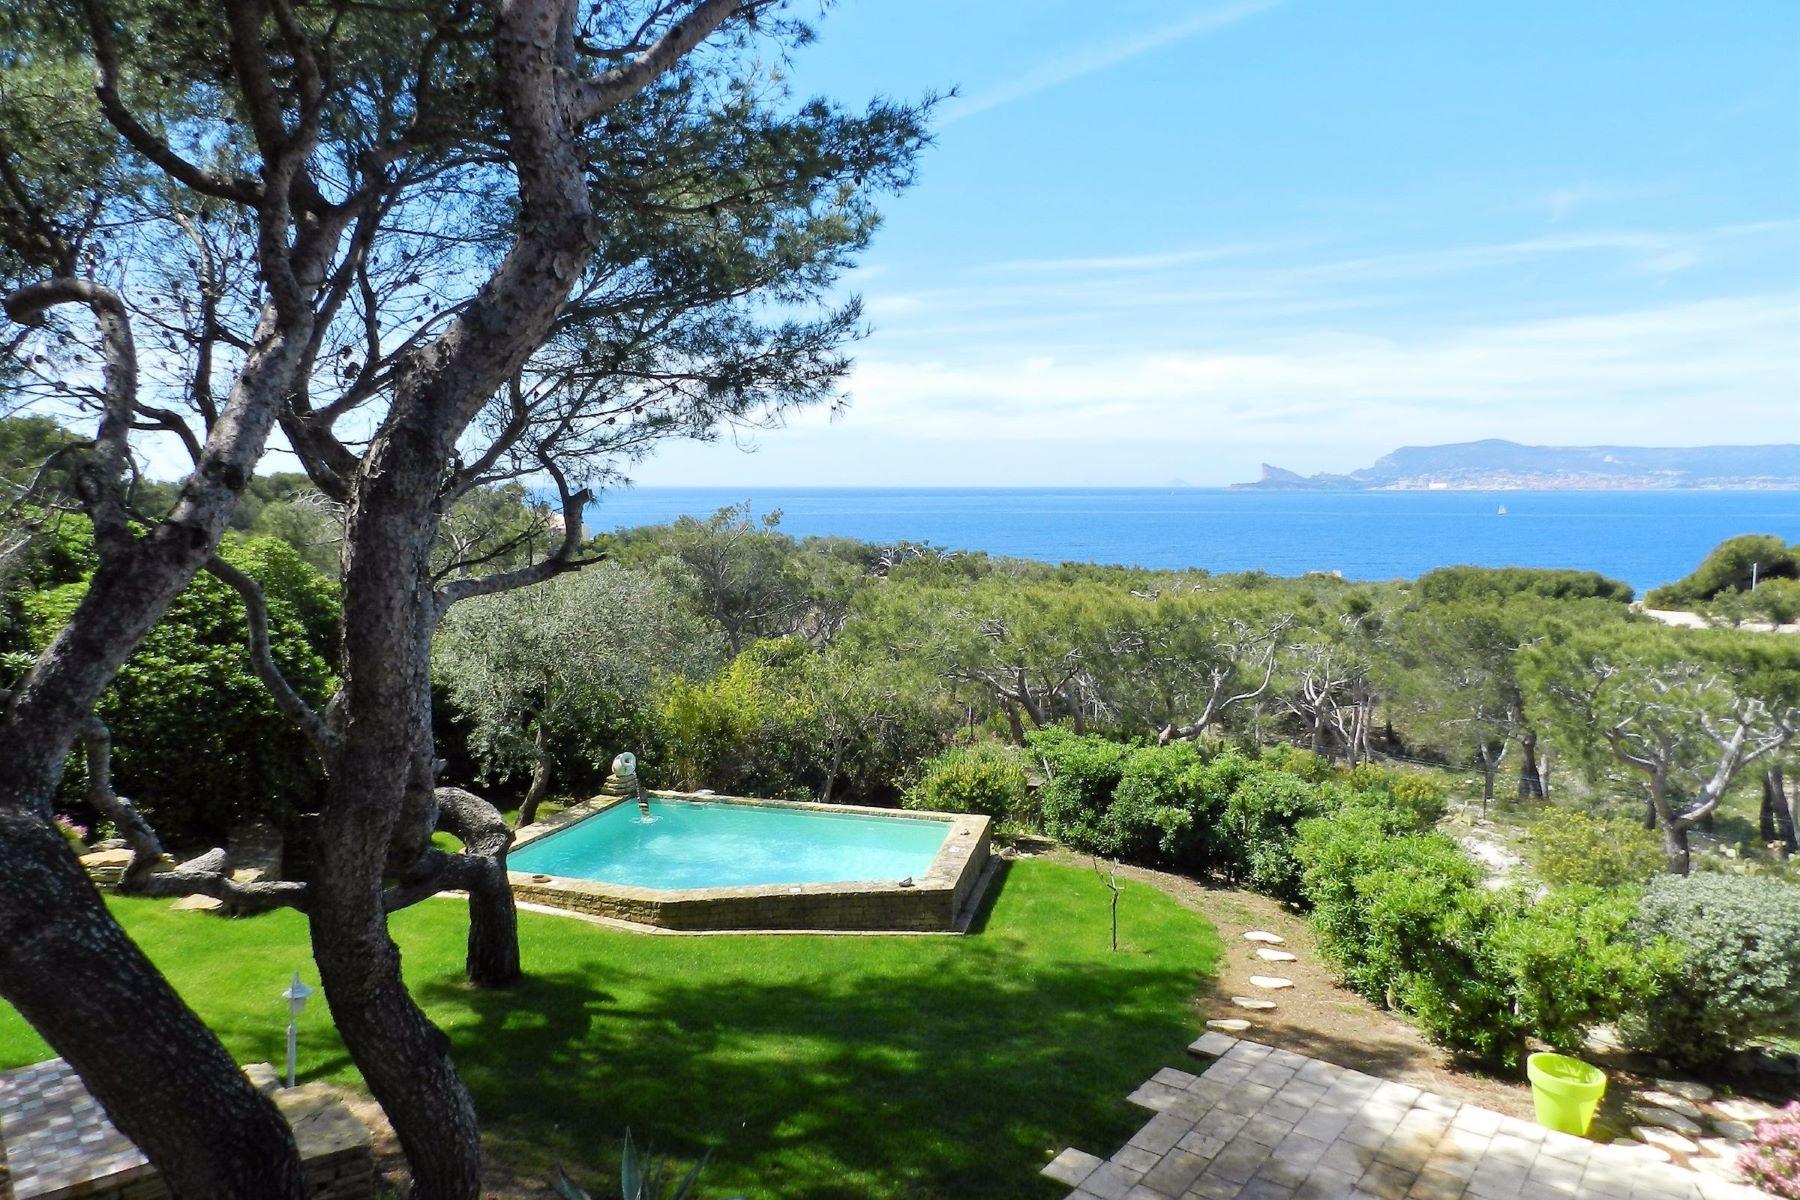 Propiedad en venta Other Provence-Alpes-Cote D'Azur